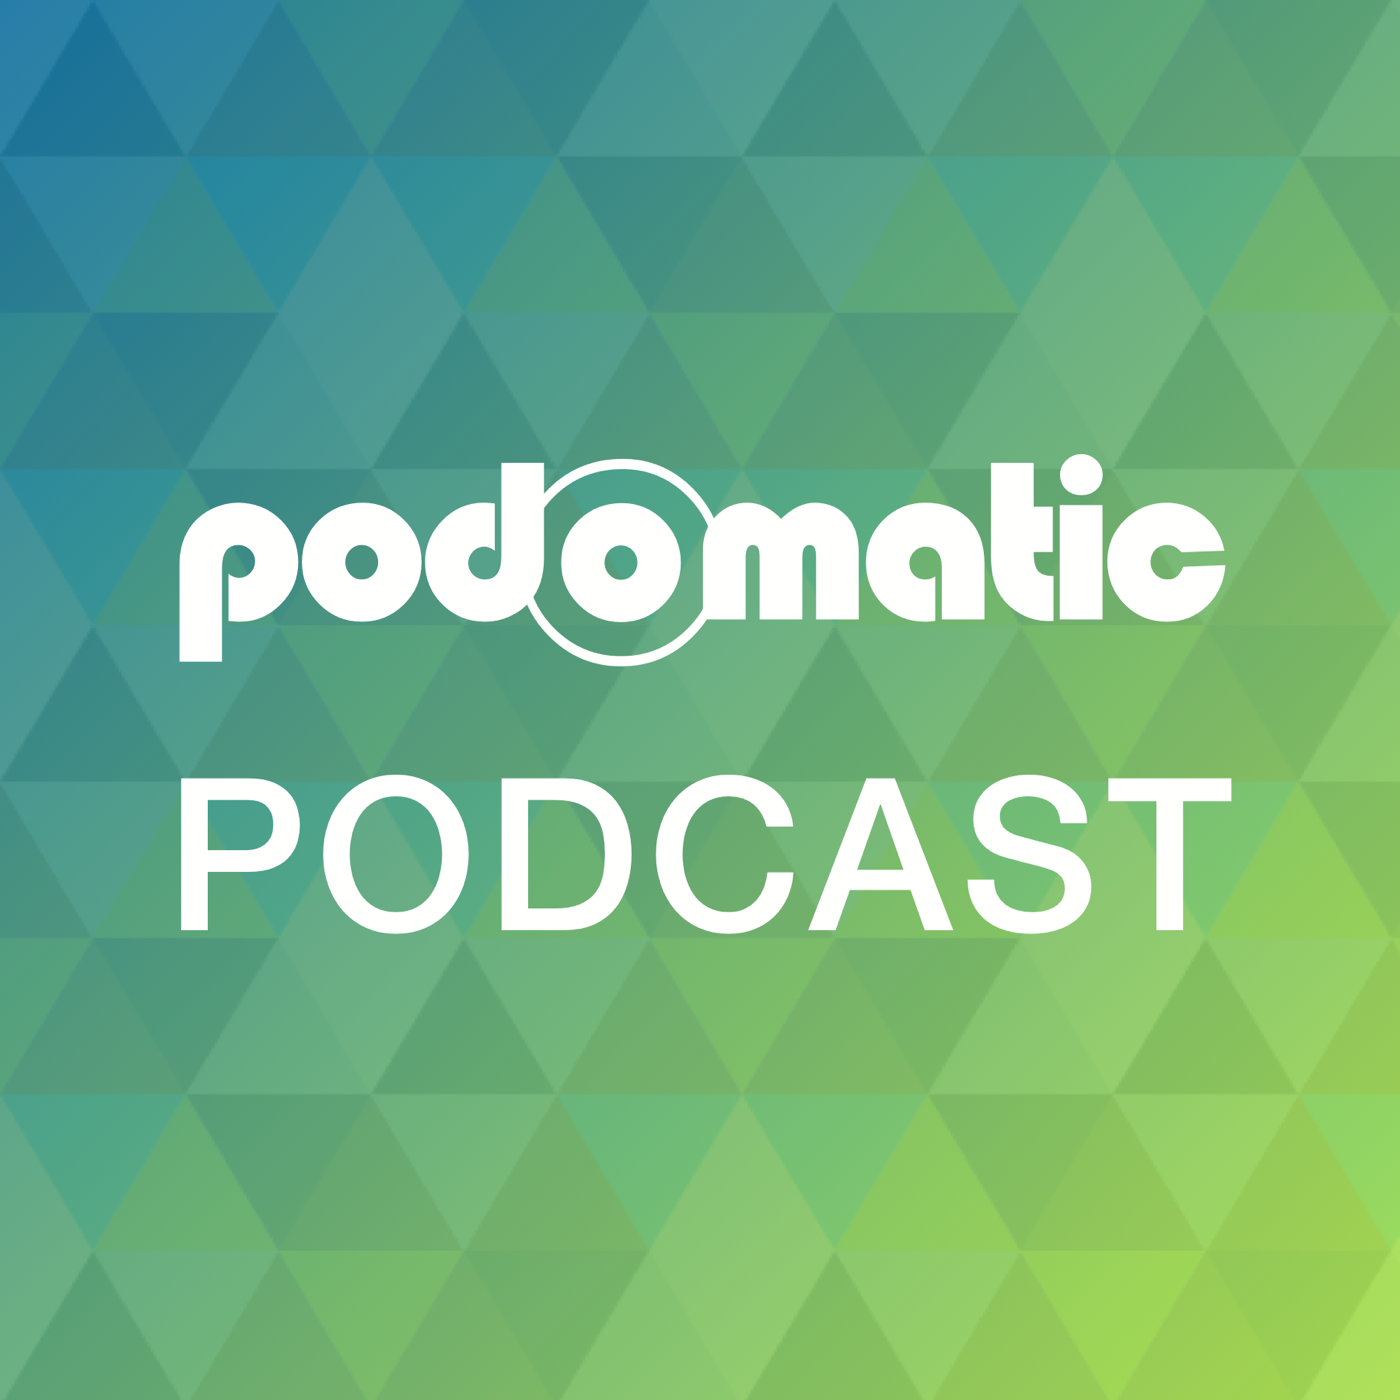 James Harrison's Podcast